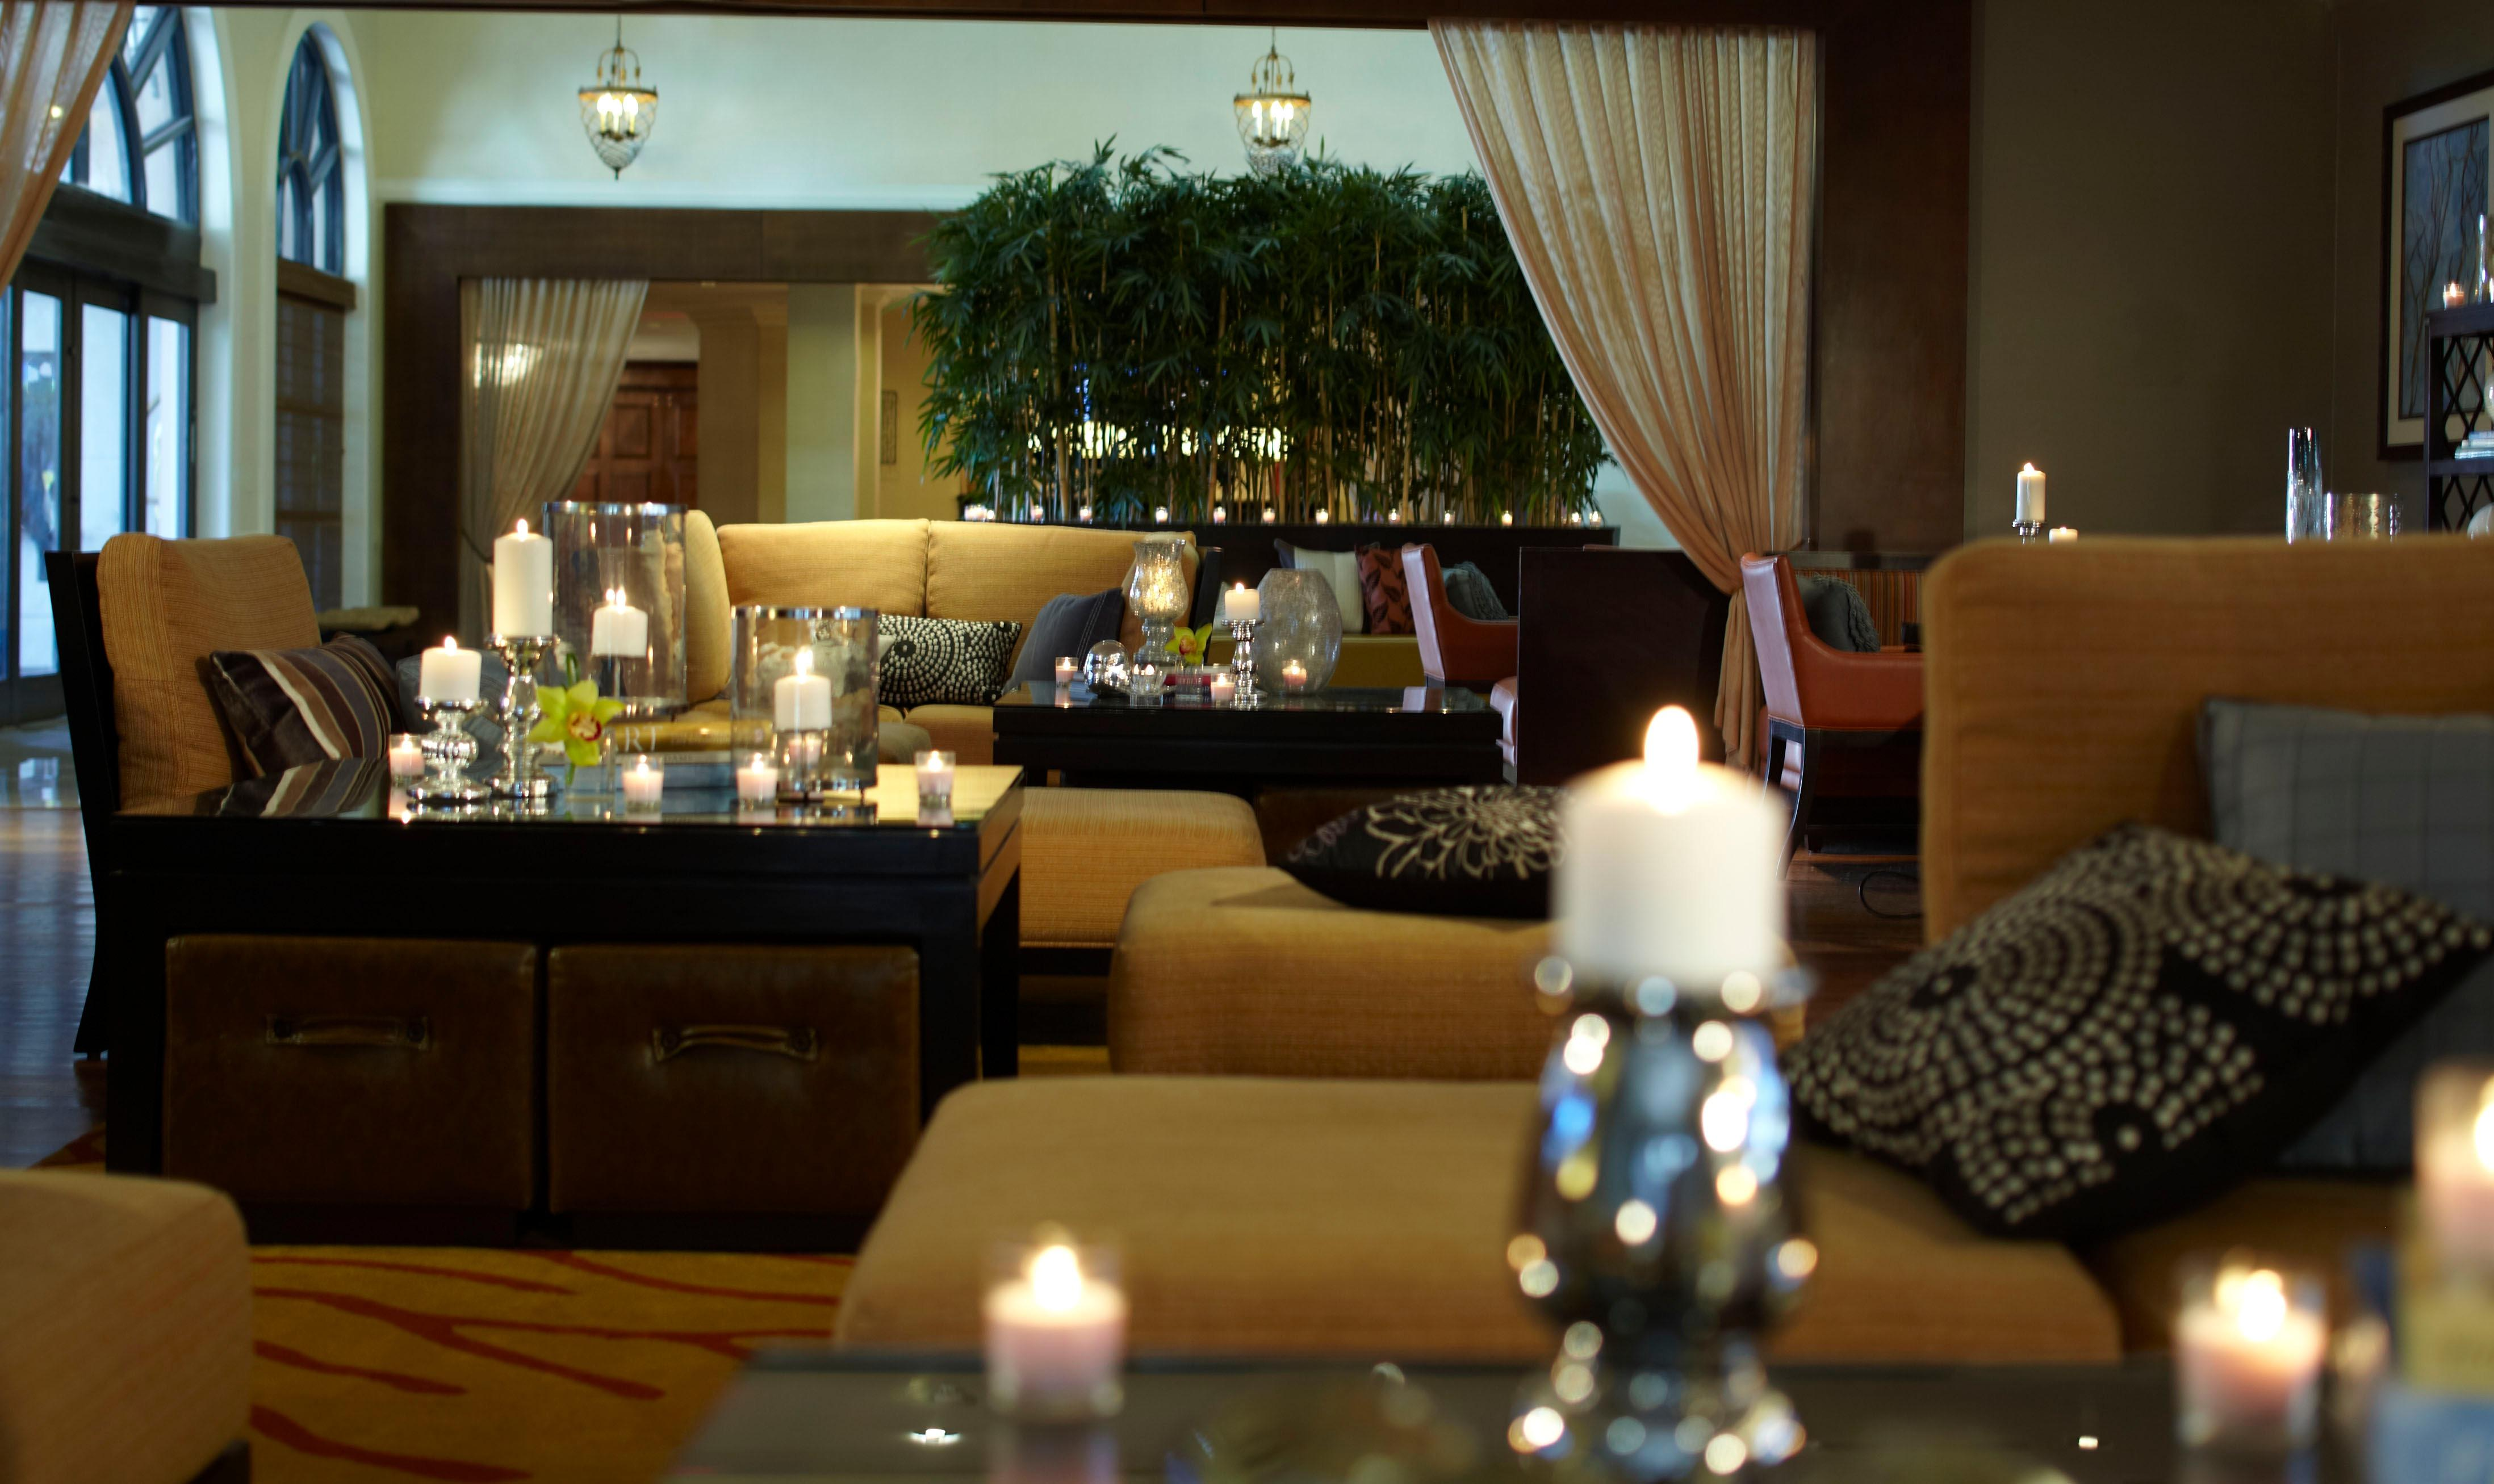 Renaissance Fort Lauderdale Cruise Port Hotel image 17